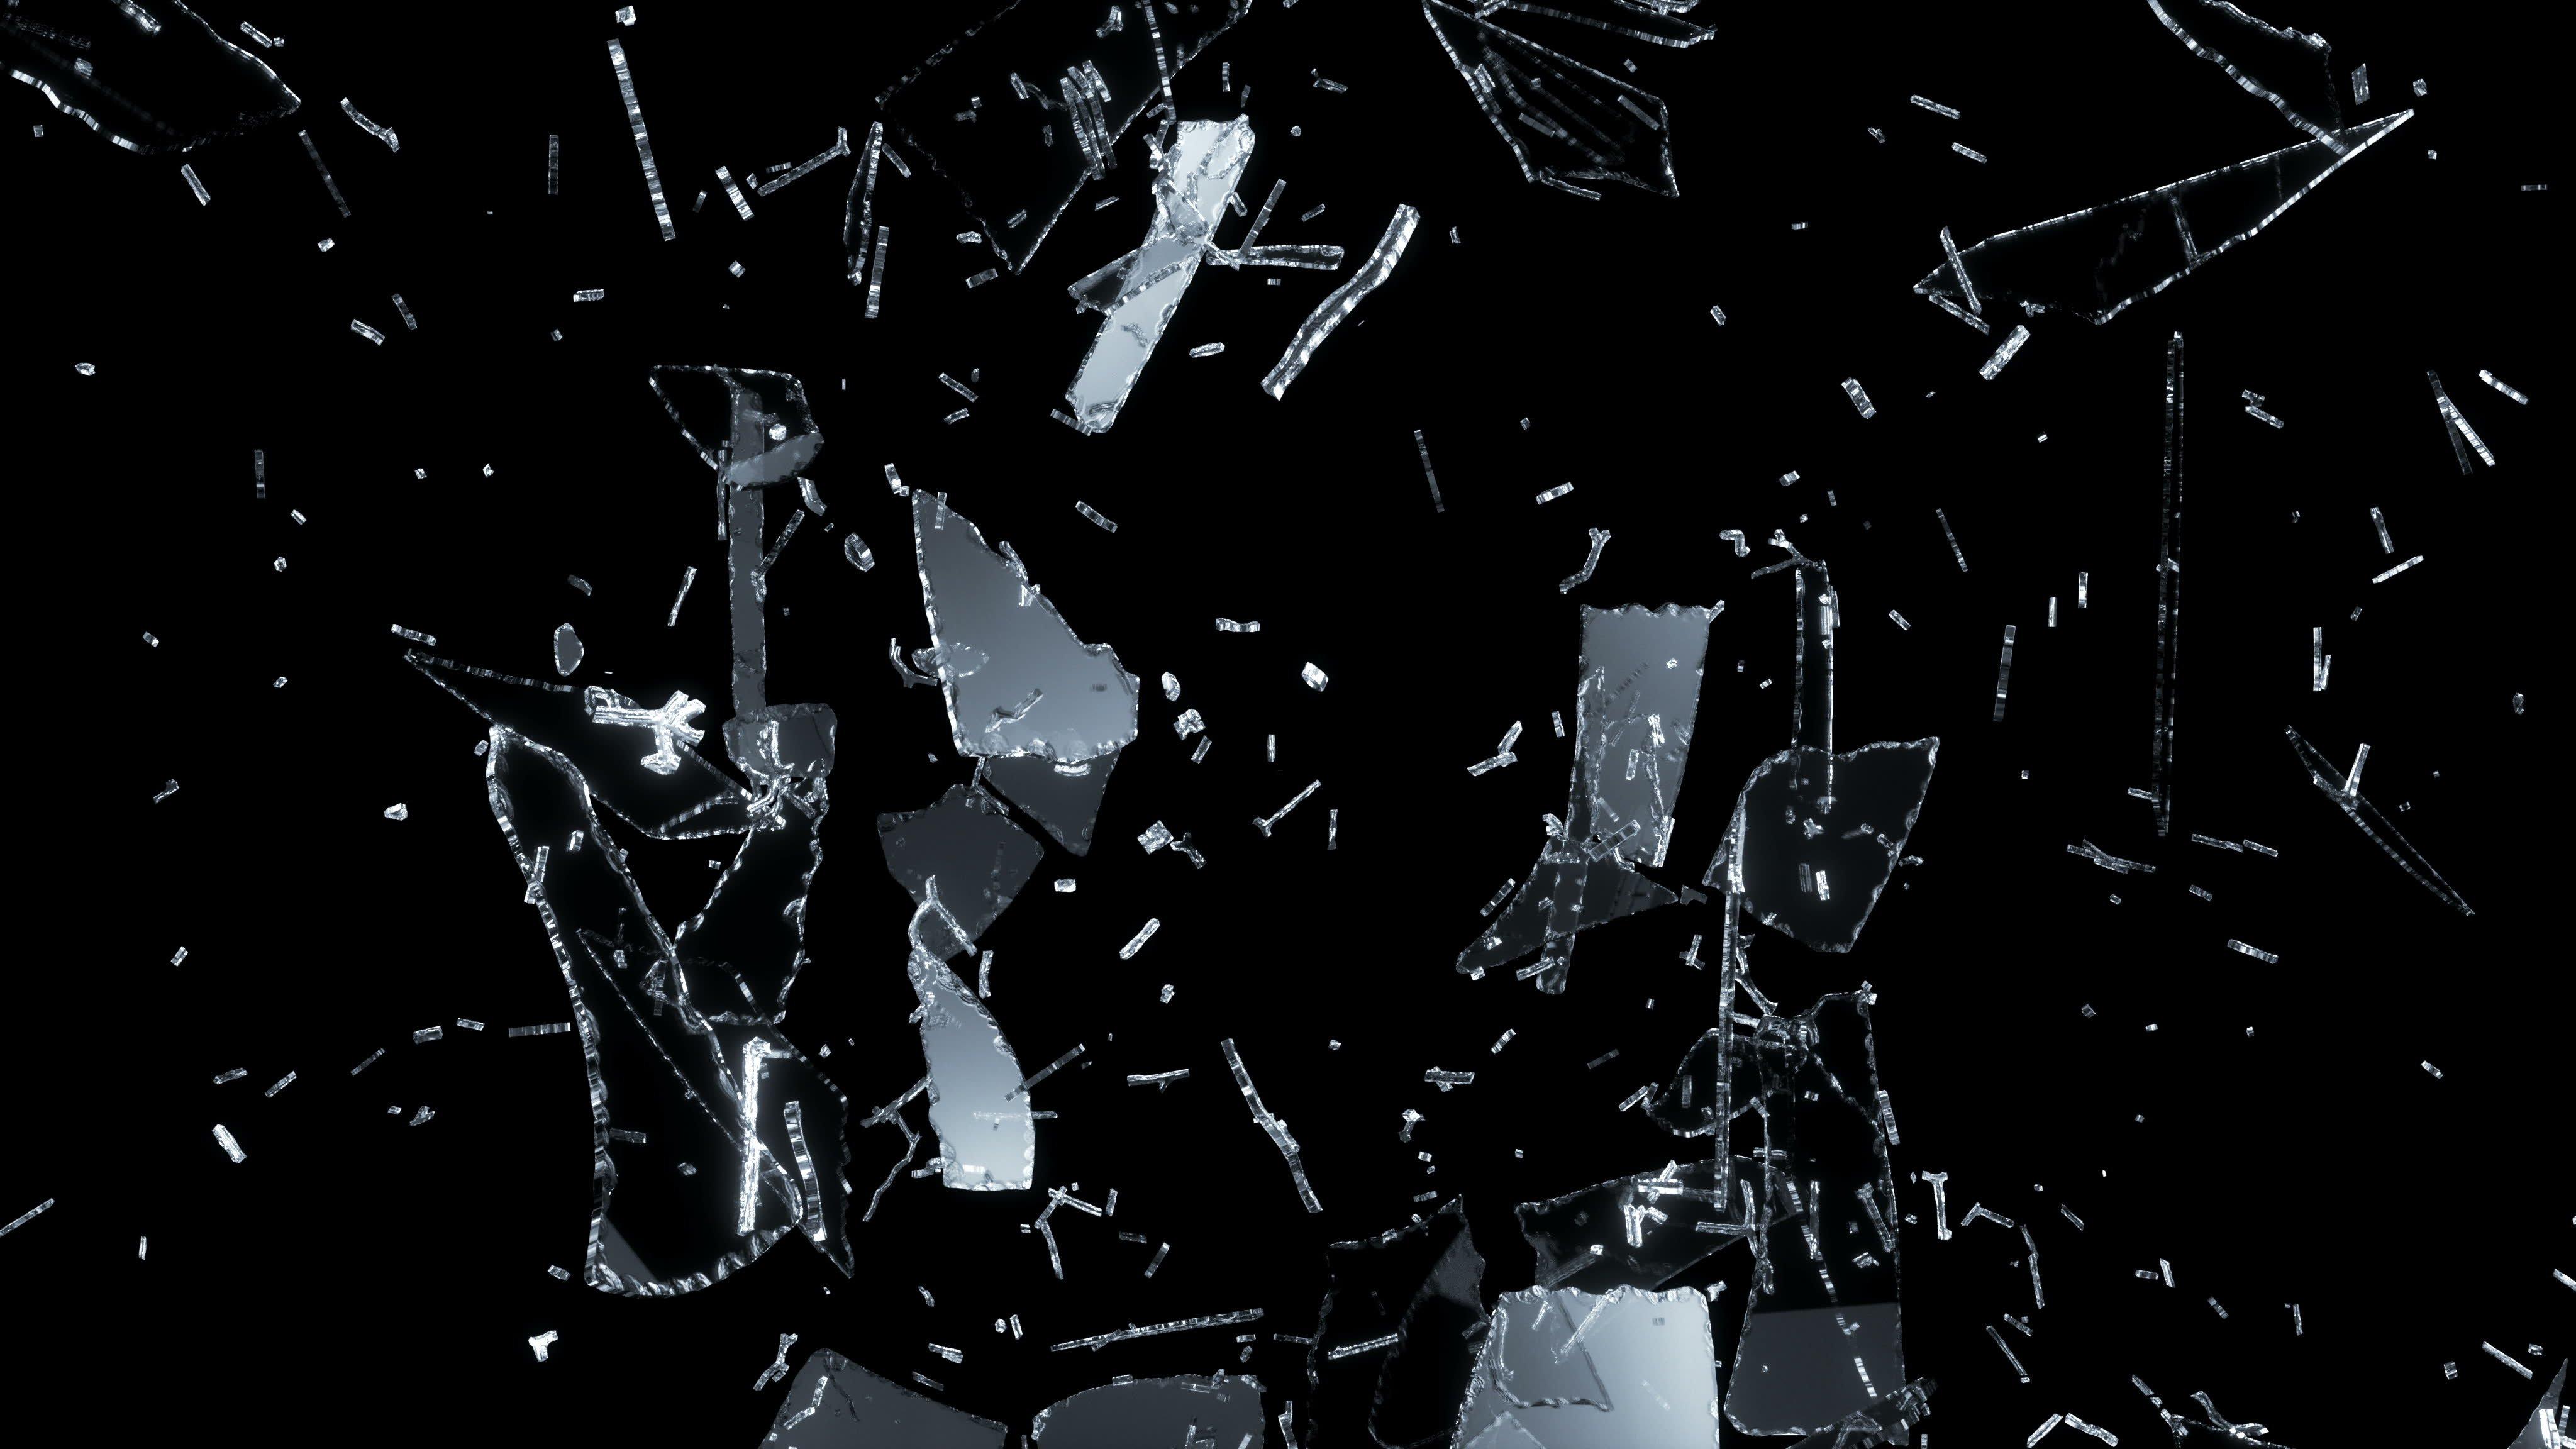 Fondos de pantalla Explosión vidrios roto fondo negro